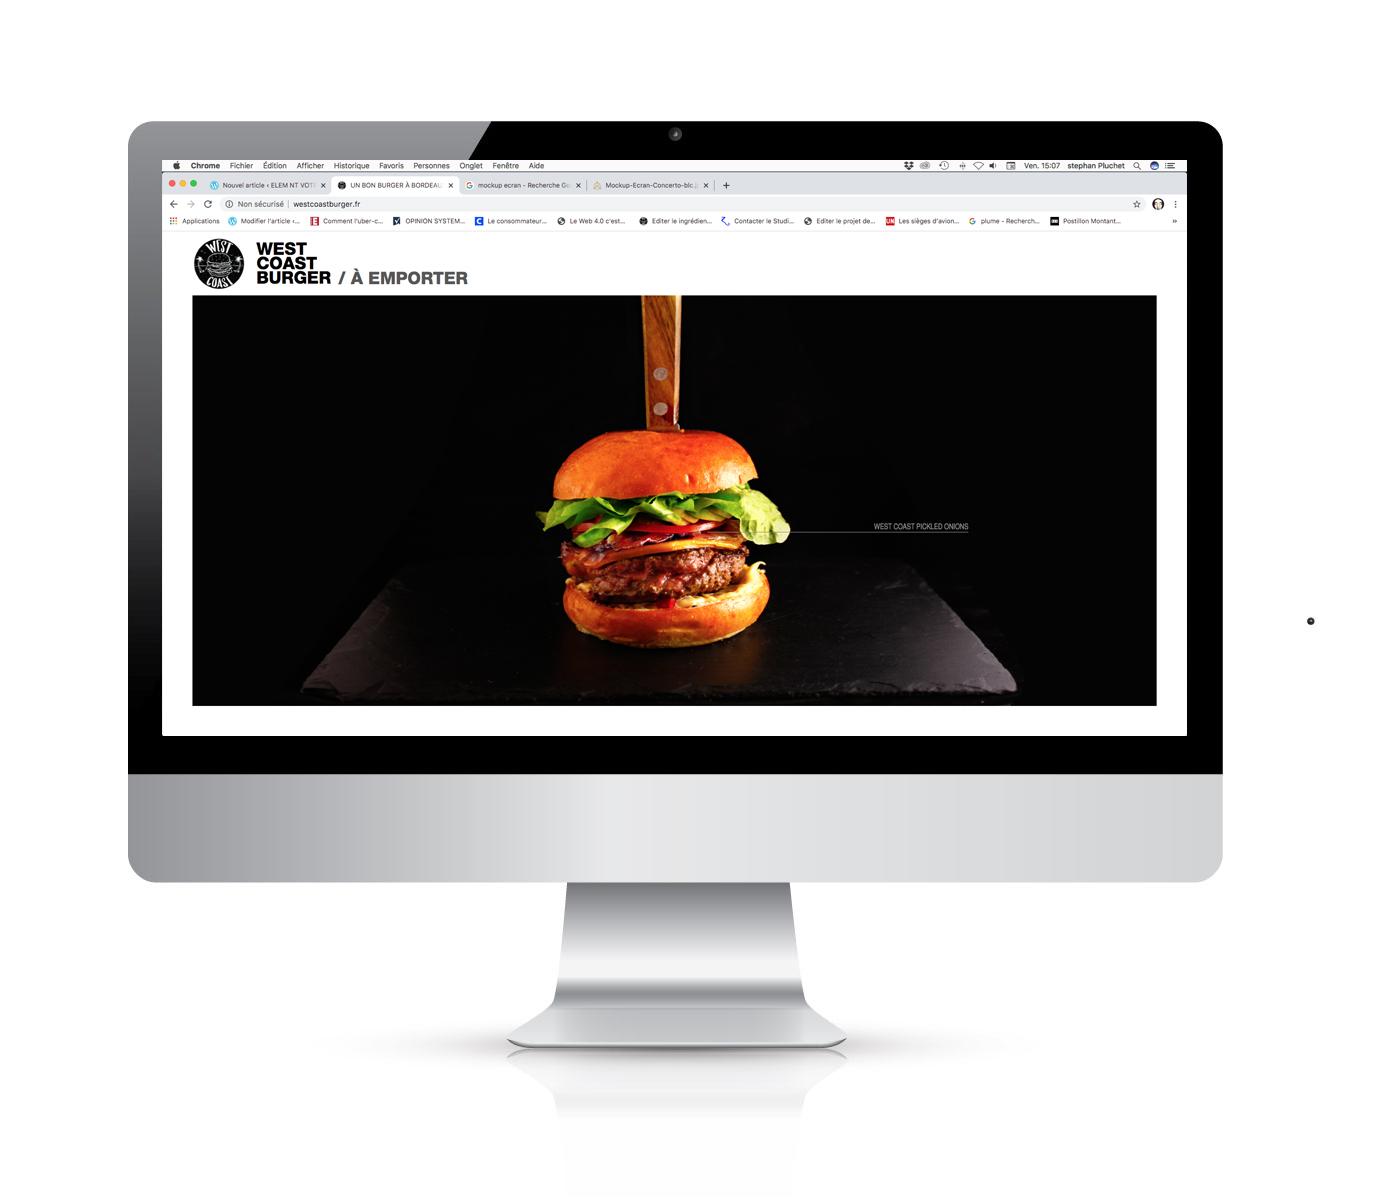 westcoastburger by element-1